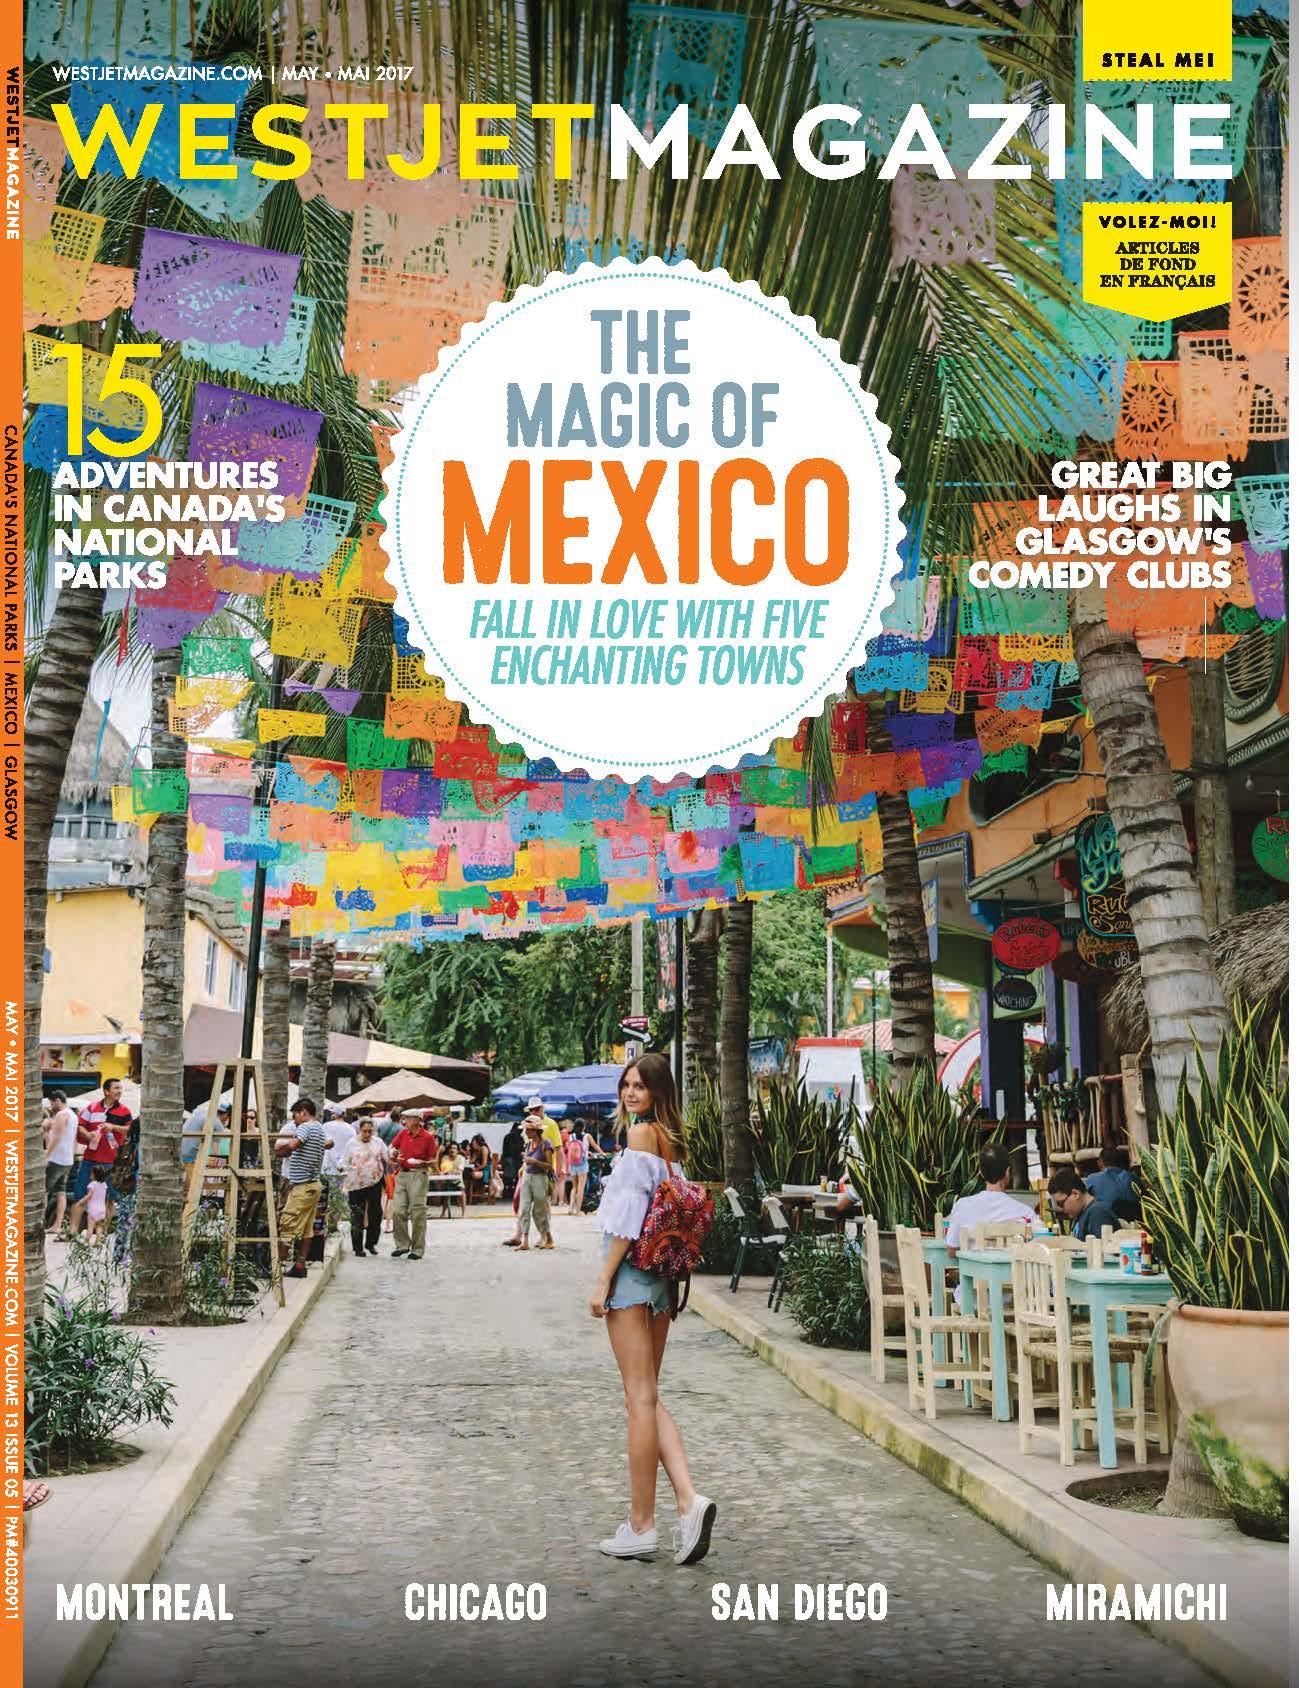 WestJet Magazine May 2017_Page_1.jpg